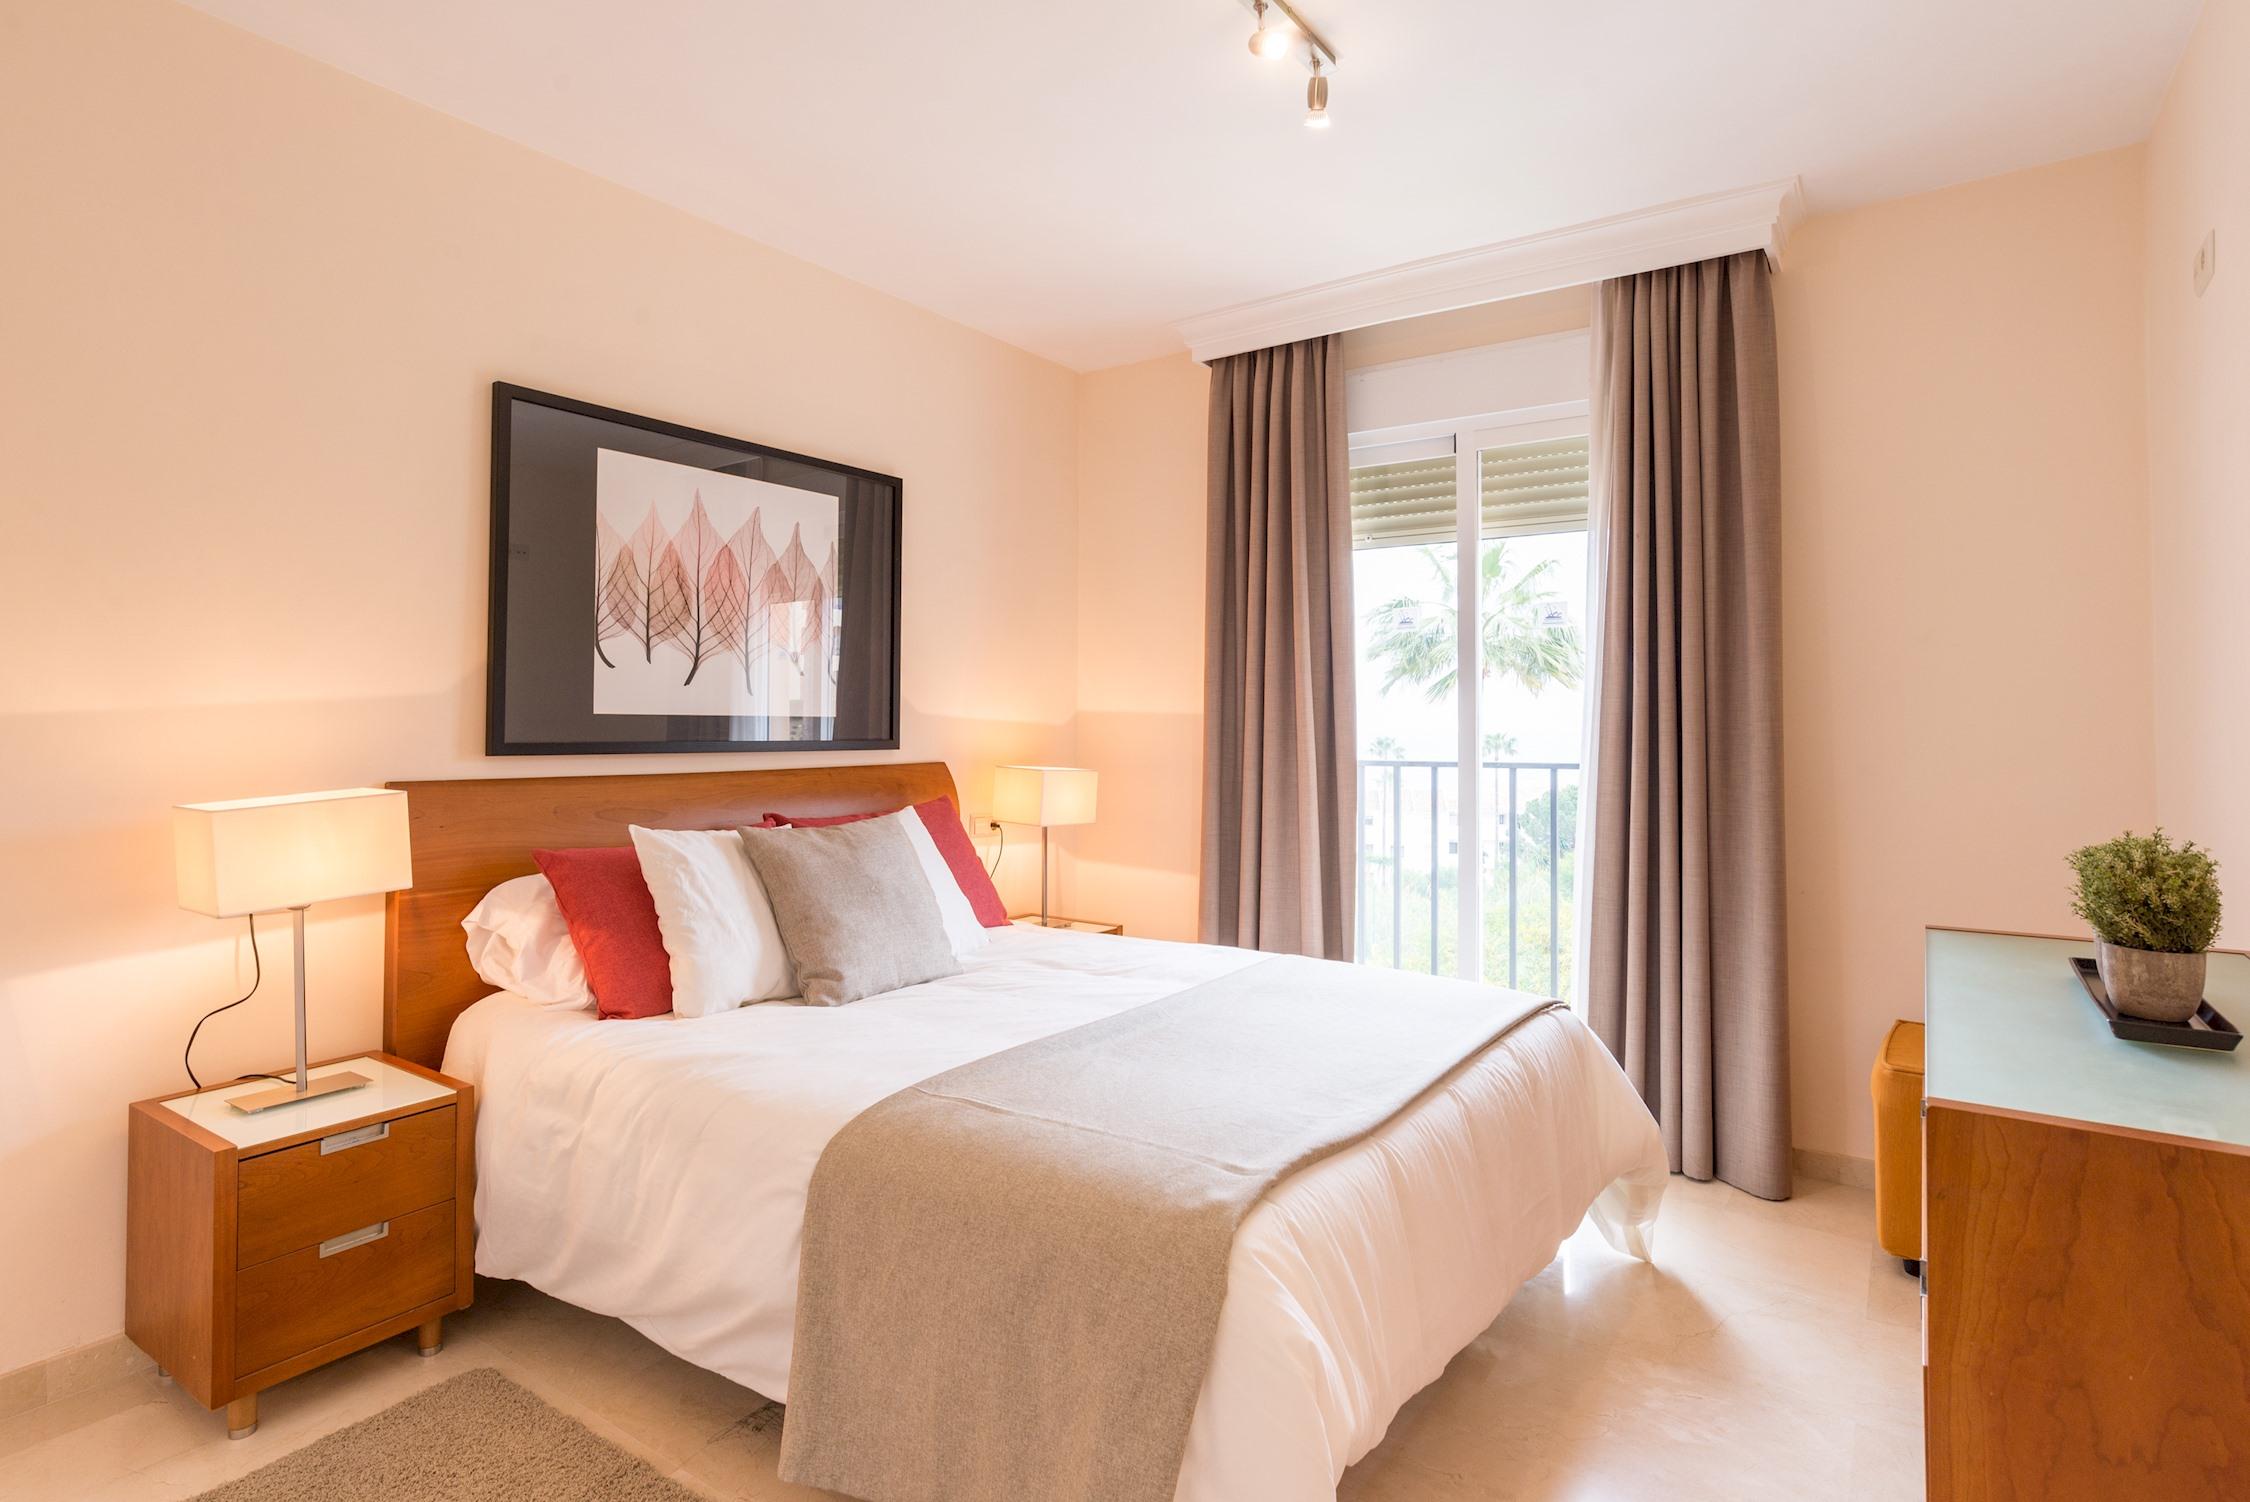 Apartment MalagaSuite Luxury   Relax photo 20518581